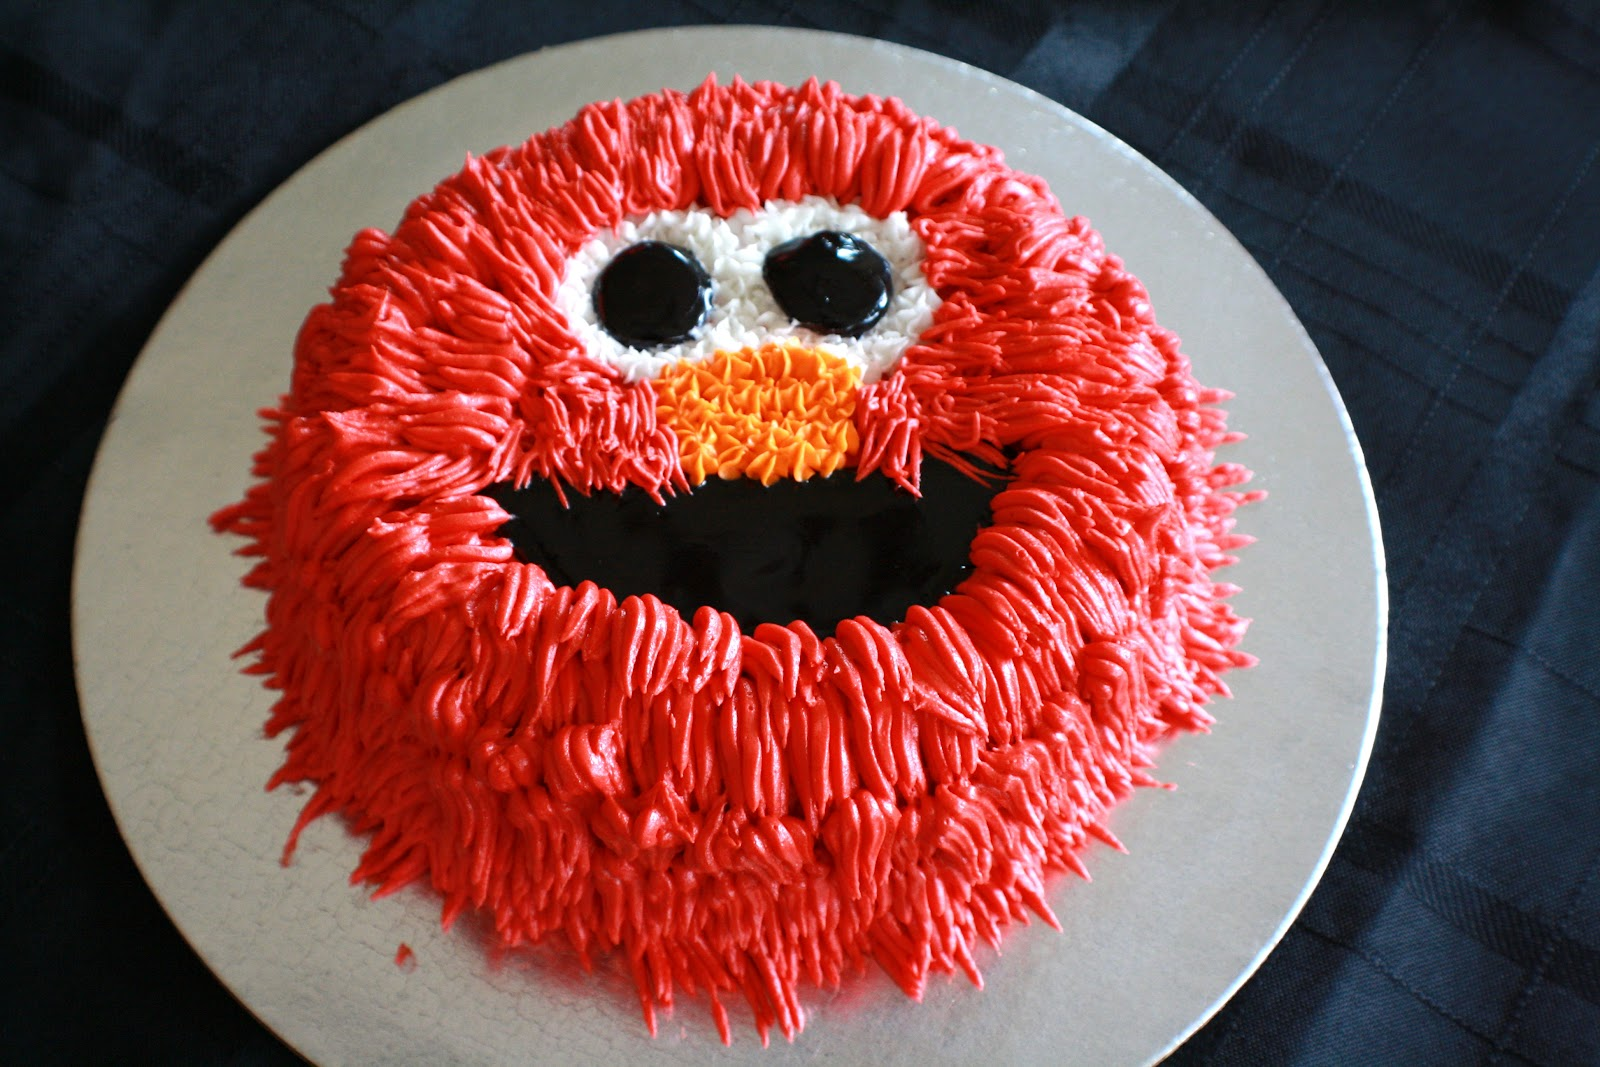 The Sugar Therapist Elmo Loves To Celebrate